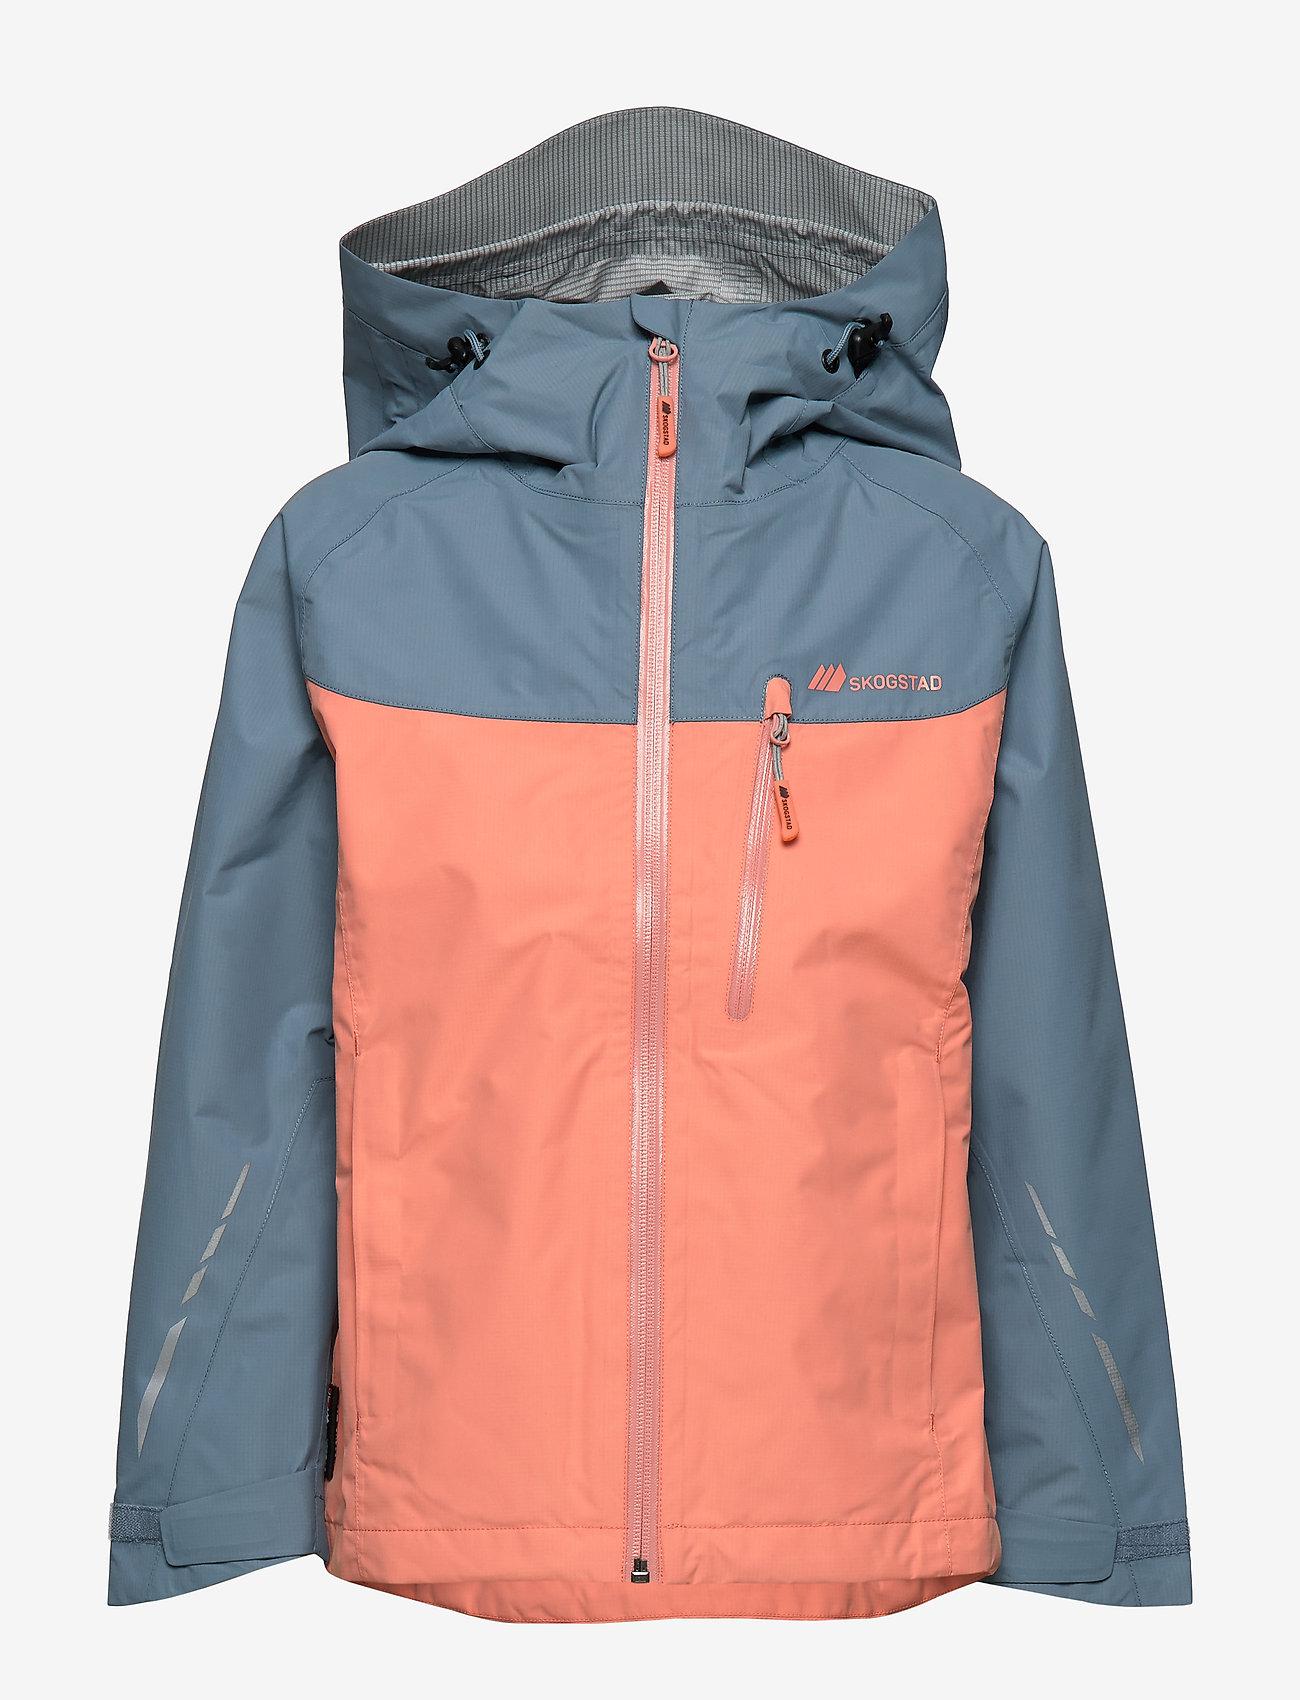 Lesja 2,5 layer Technical Shell Jacket (Orange Mist) (699.30